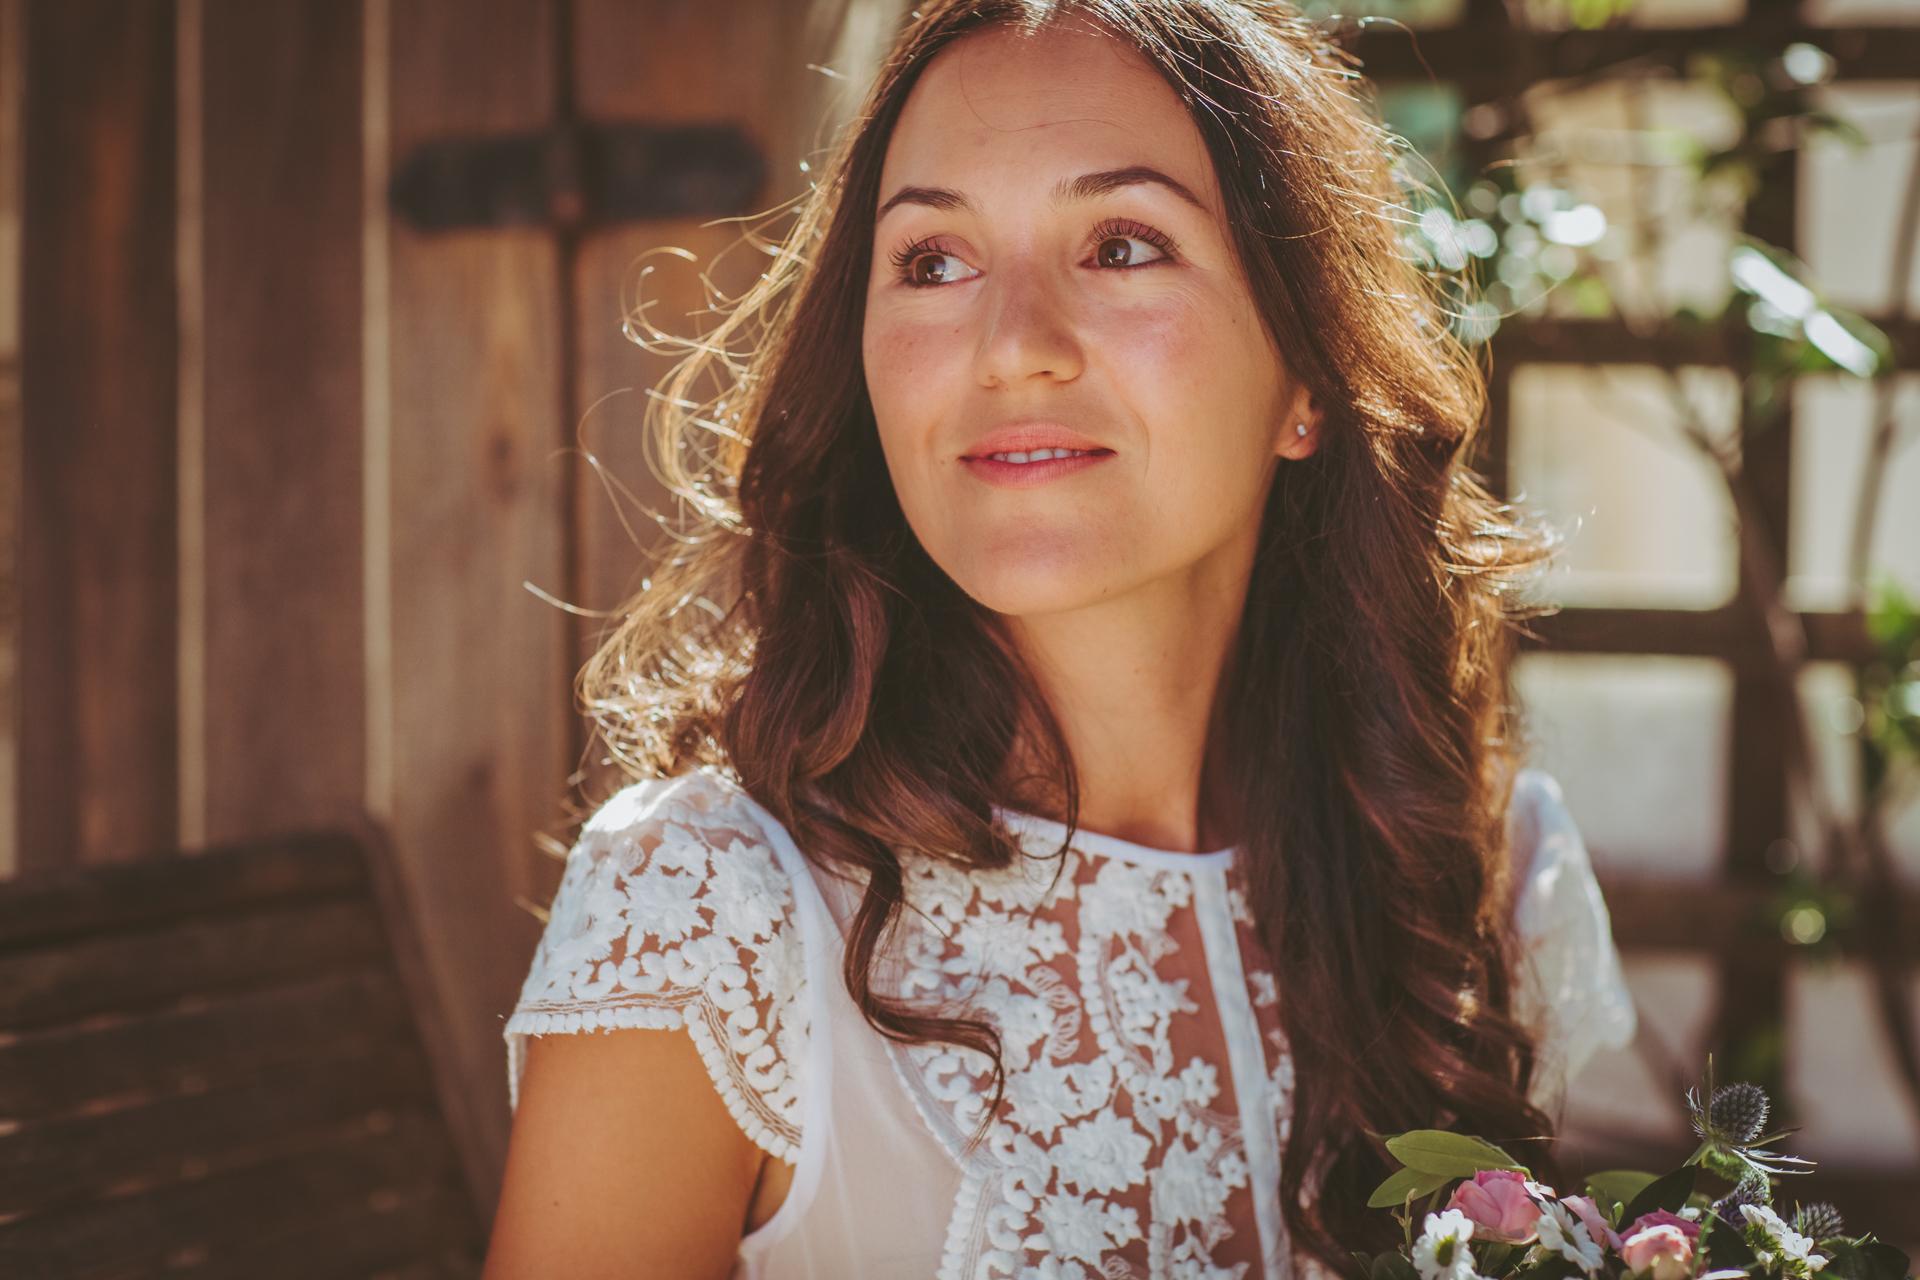 Fotógrafo de bodas donostía san sebastian reportaje boda en san sebastian